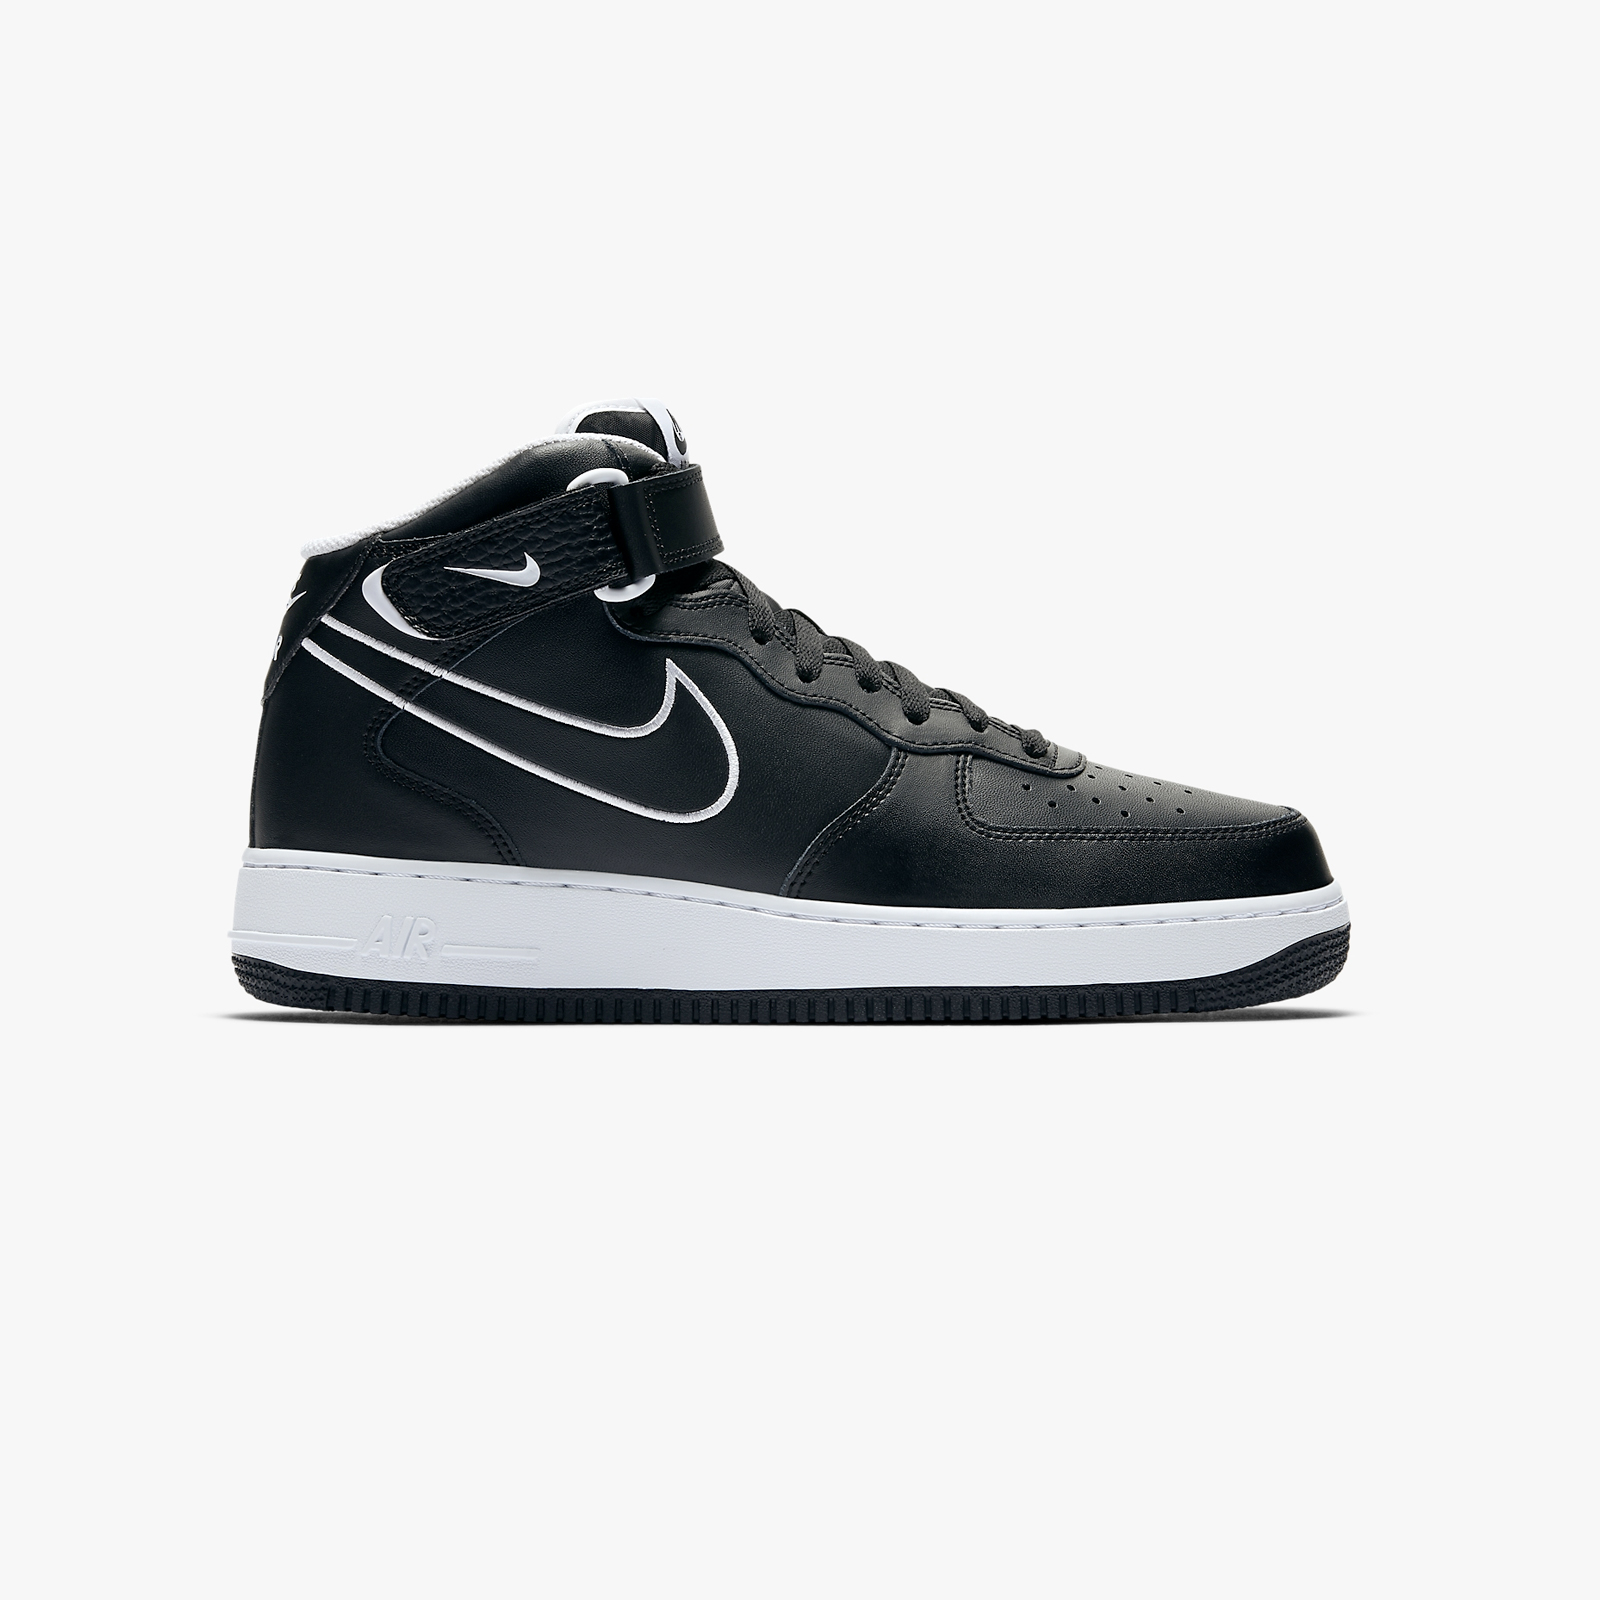 timeless design cf0c1 2586a Nike Sportswear Air Force 1 Mid 07